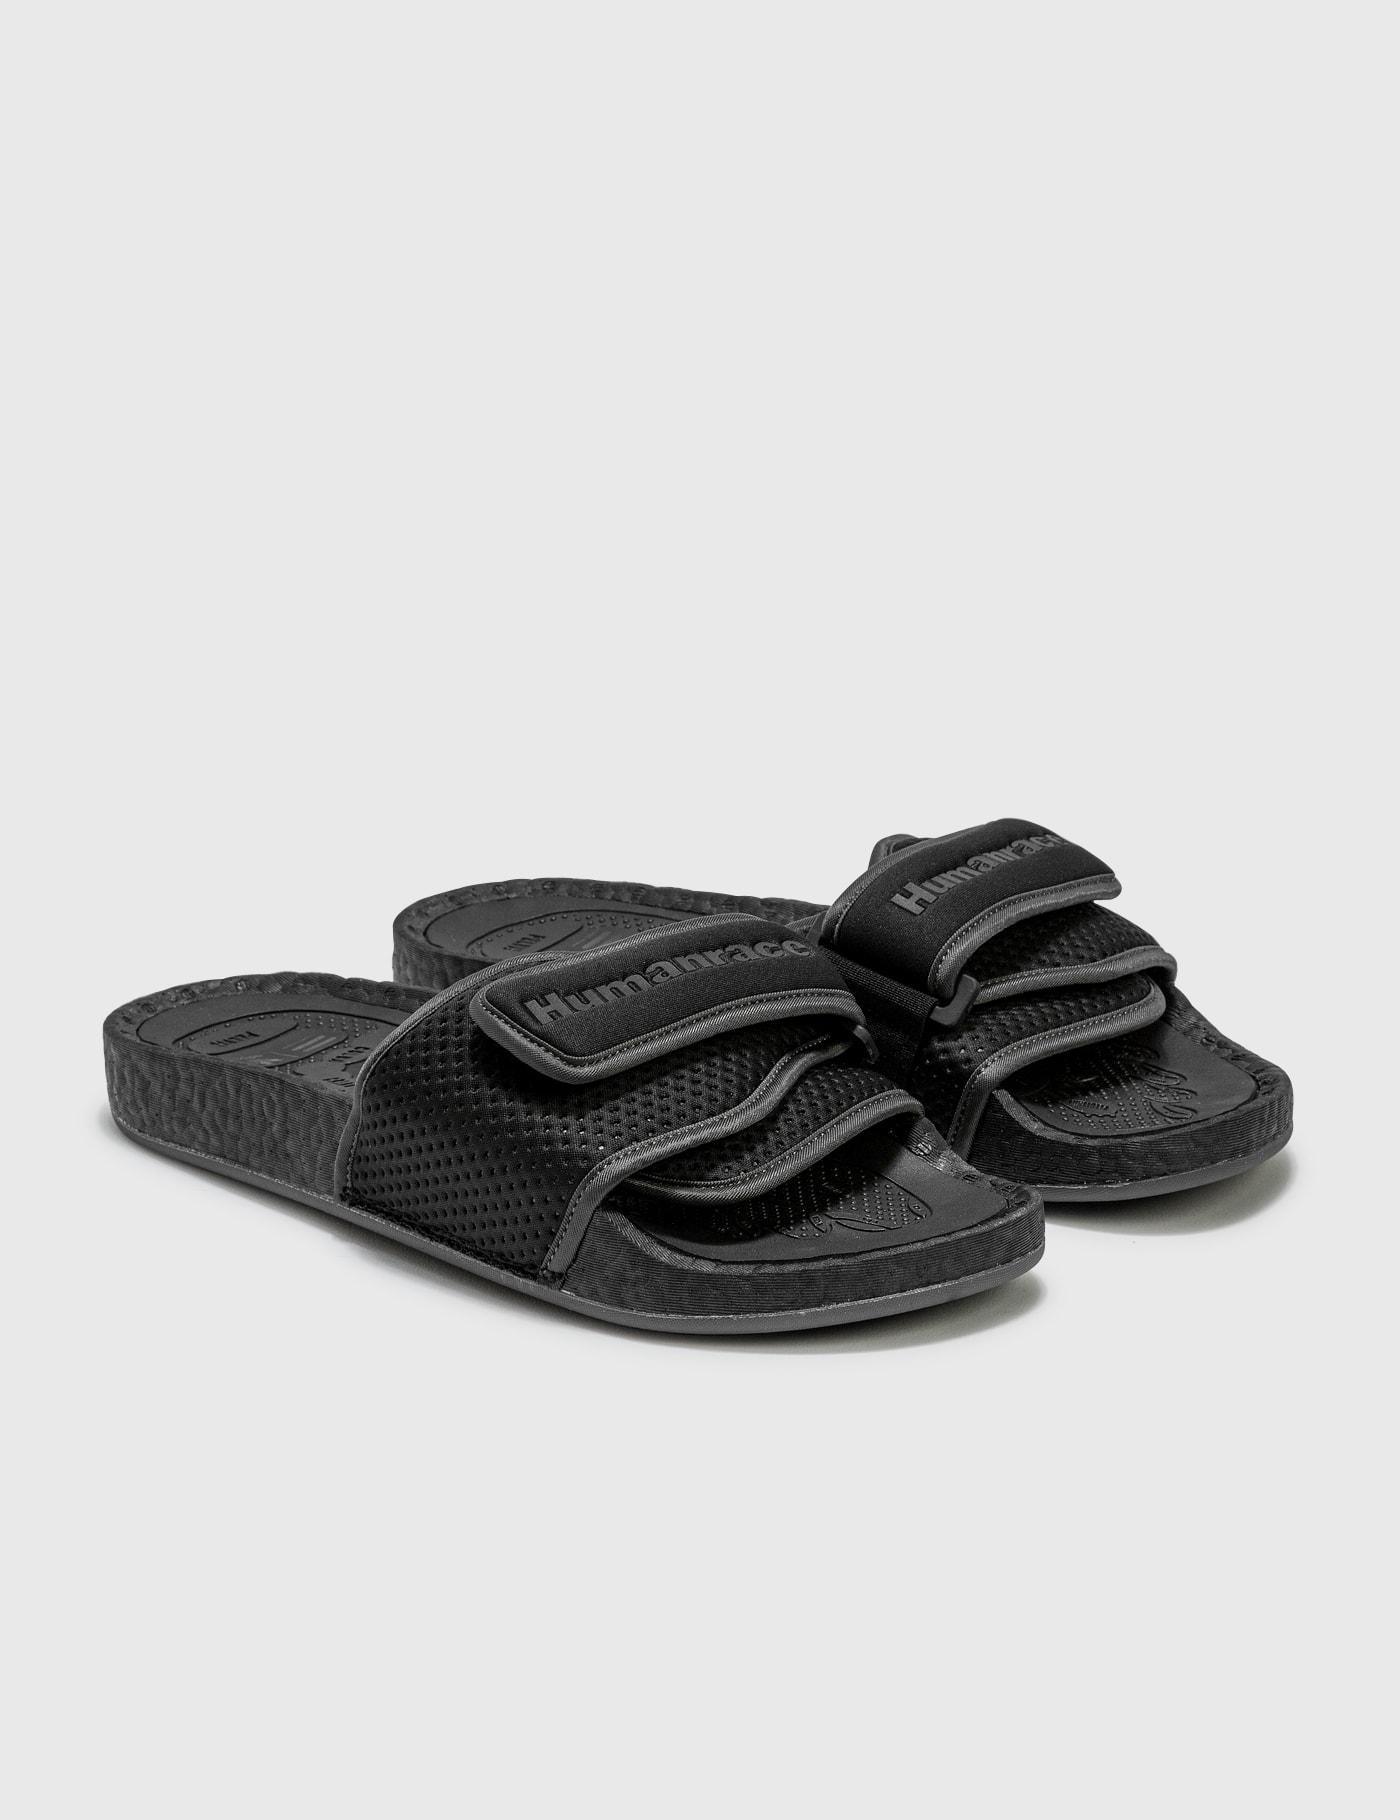 Adidas Originals Slides PHARRELL WILLIAMS CHANCLETAS HU SLIDES